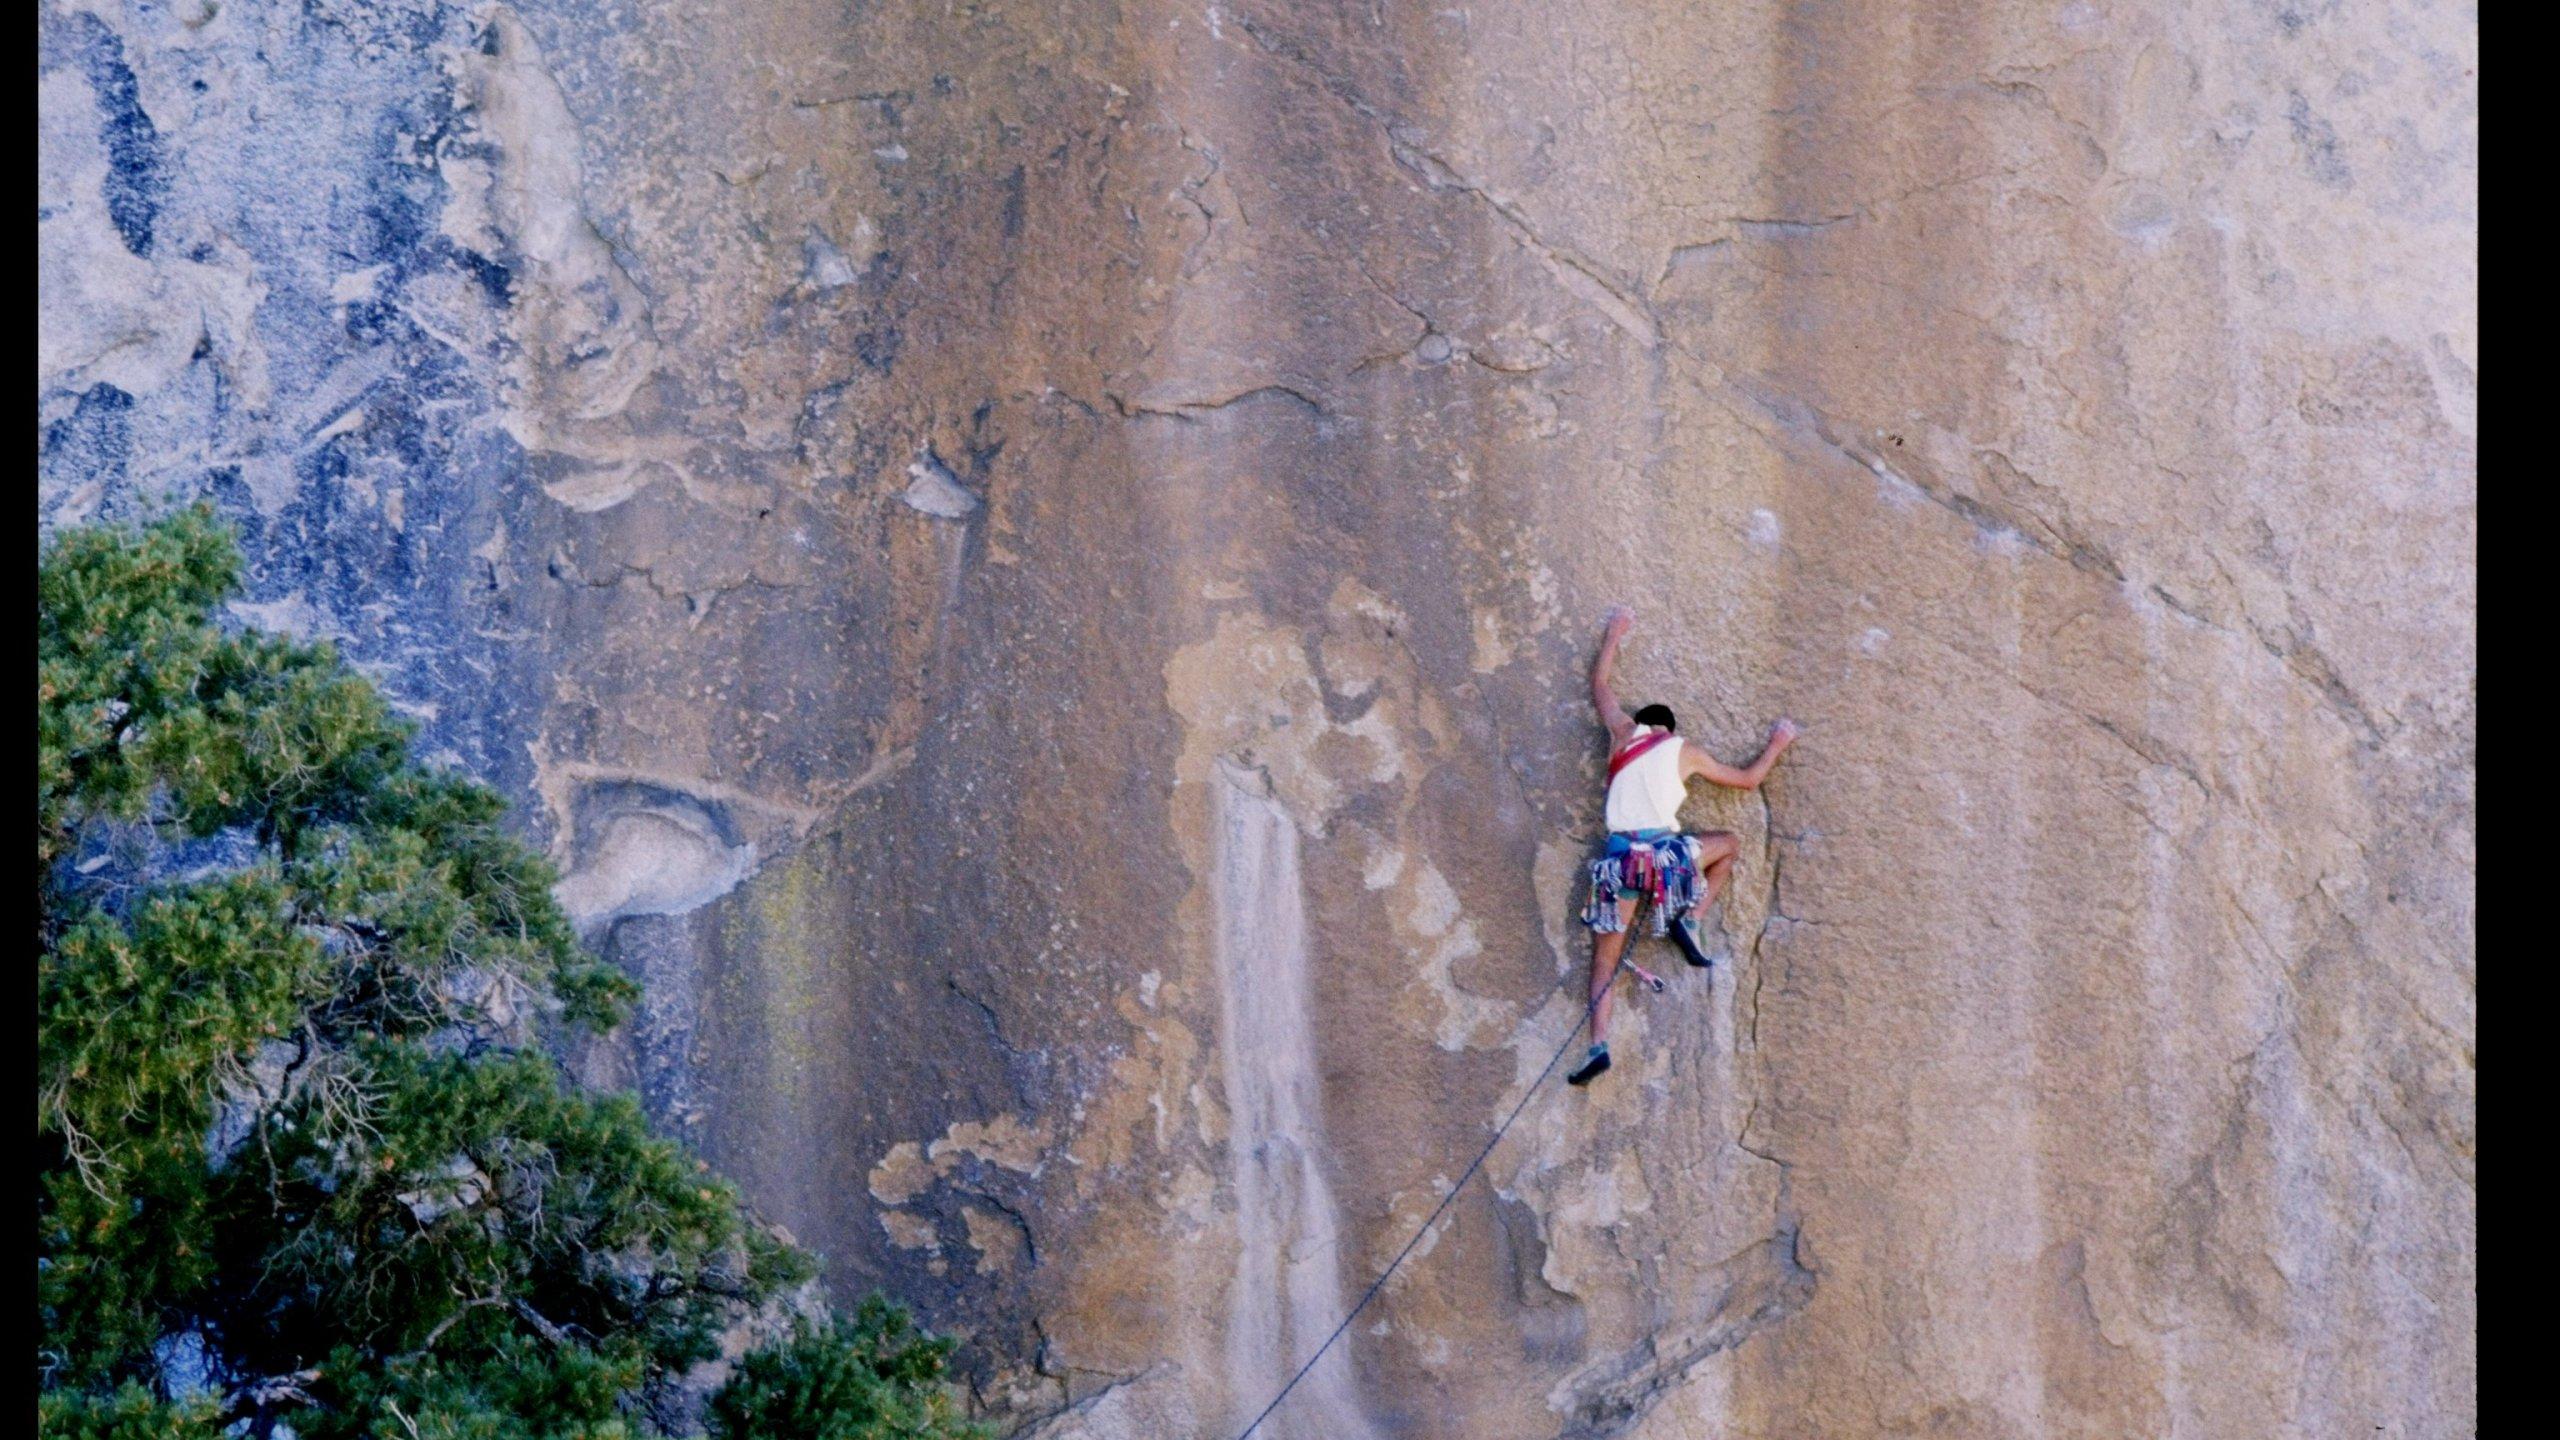 Climber death rock Climbers We